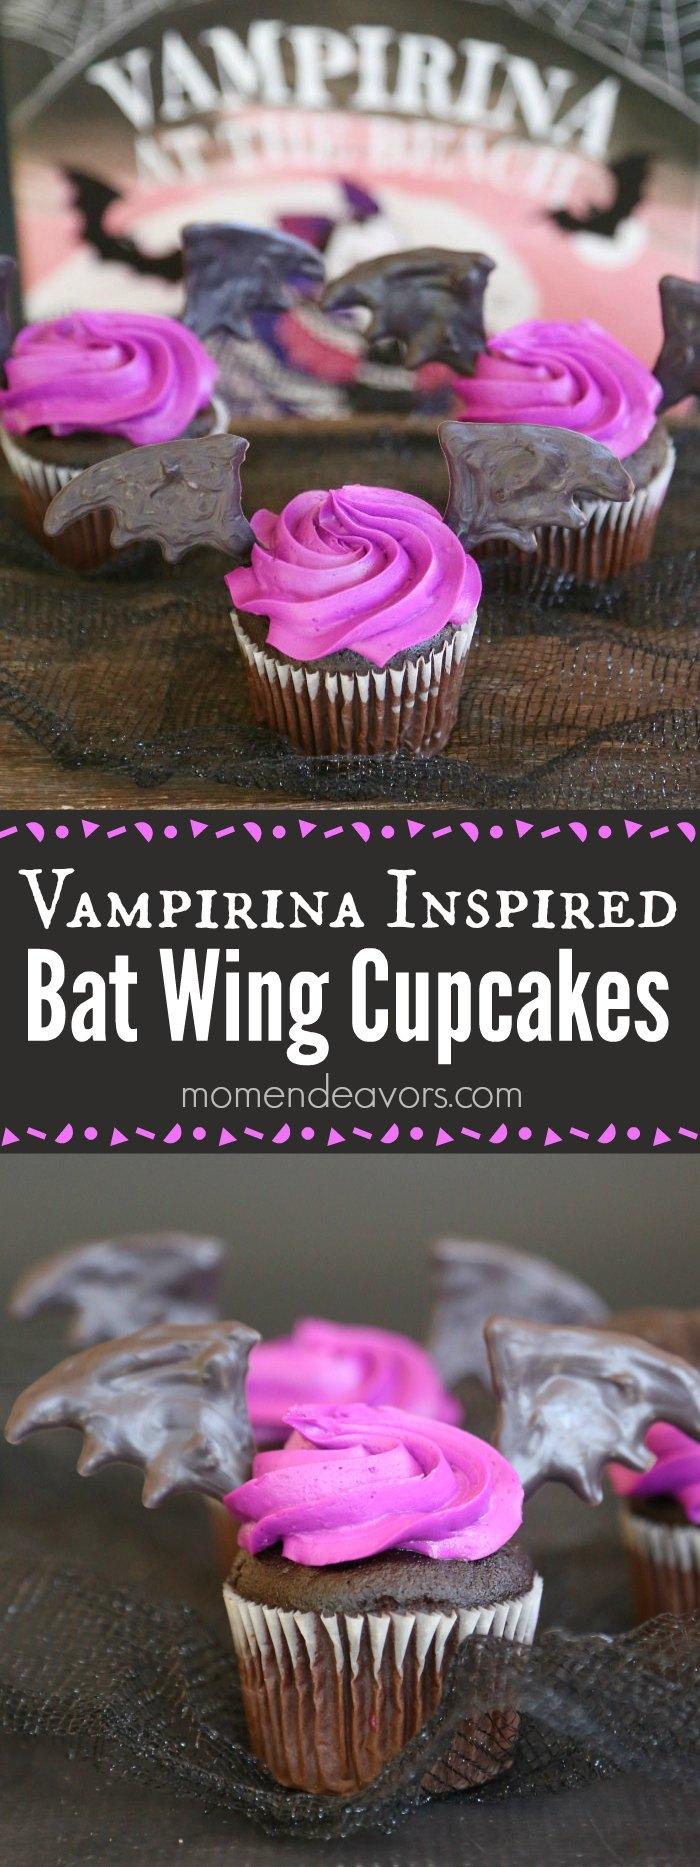 Vampirina Bat Wing Cupcakes